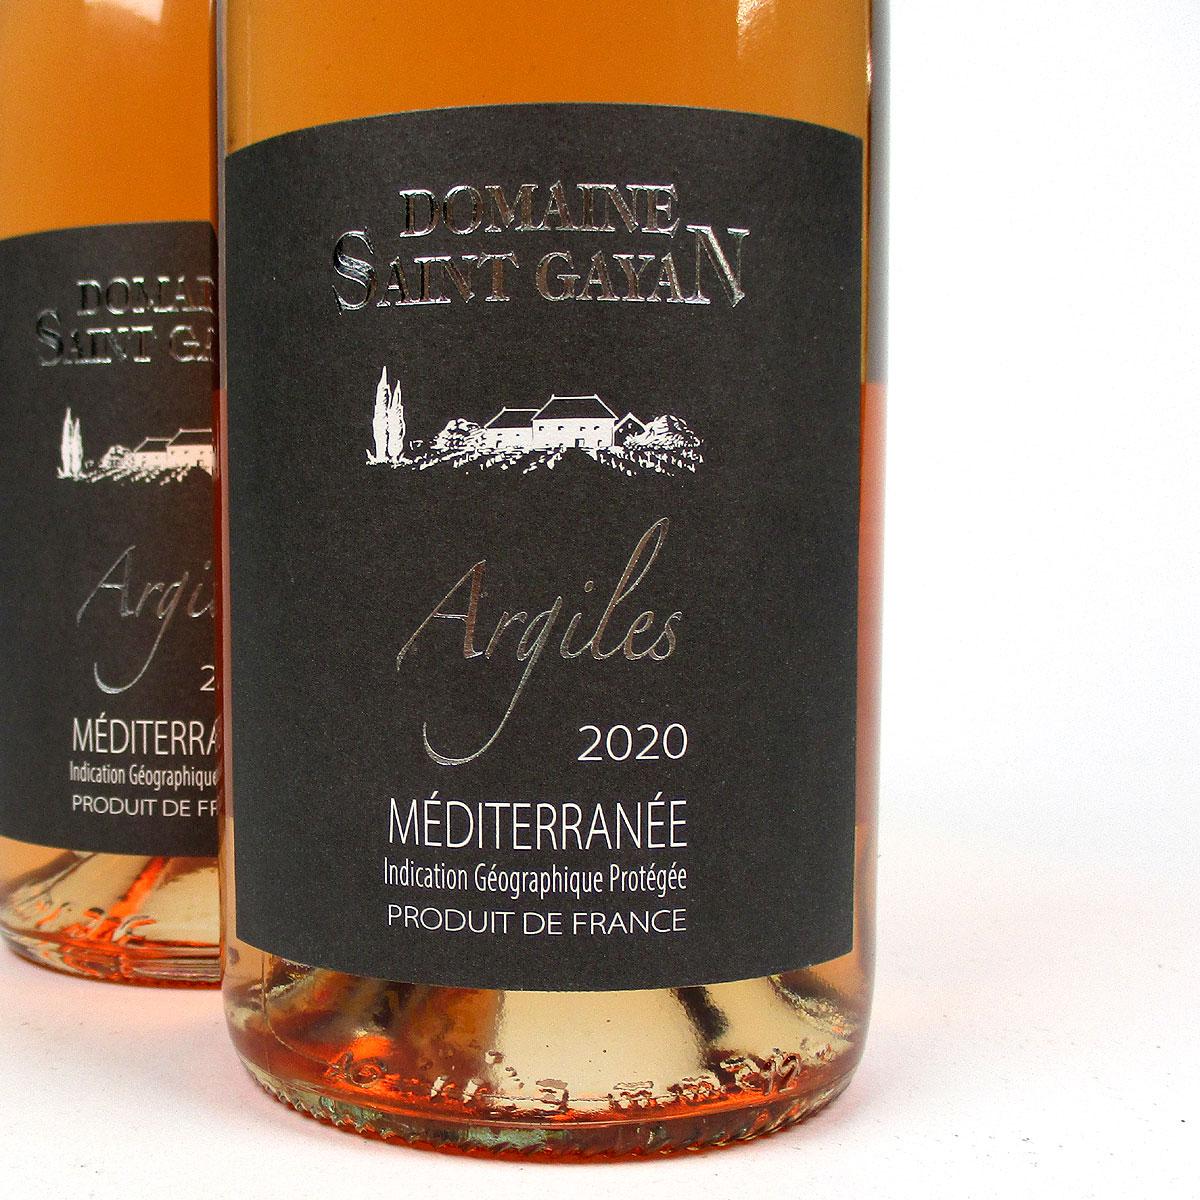 IGP Méditerranée: Domaine Saint Gayan 'Argiles' Rosé 2020